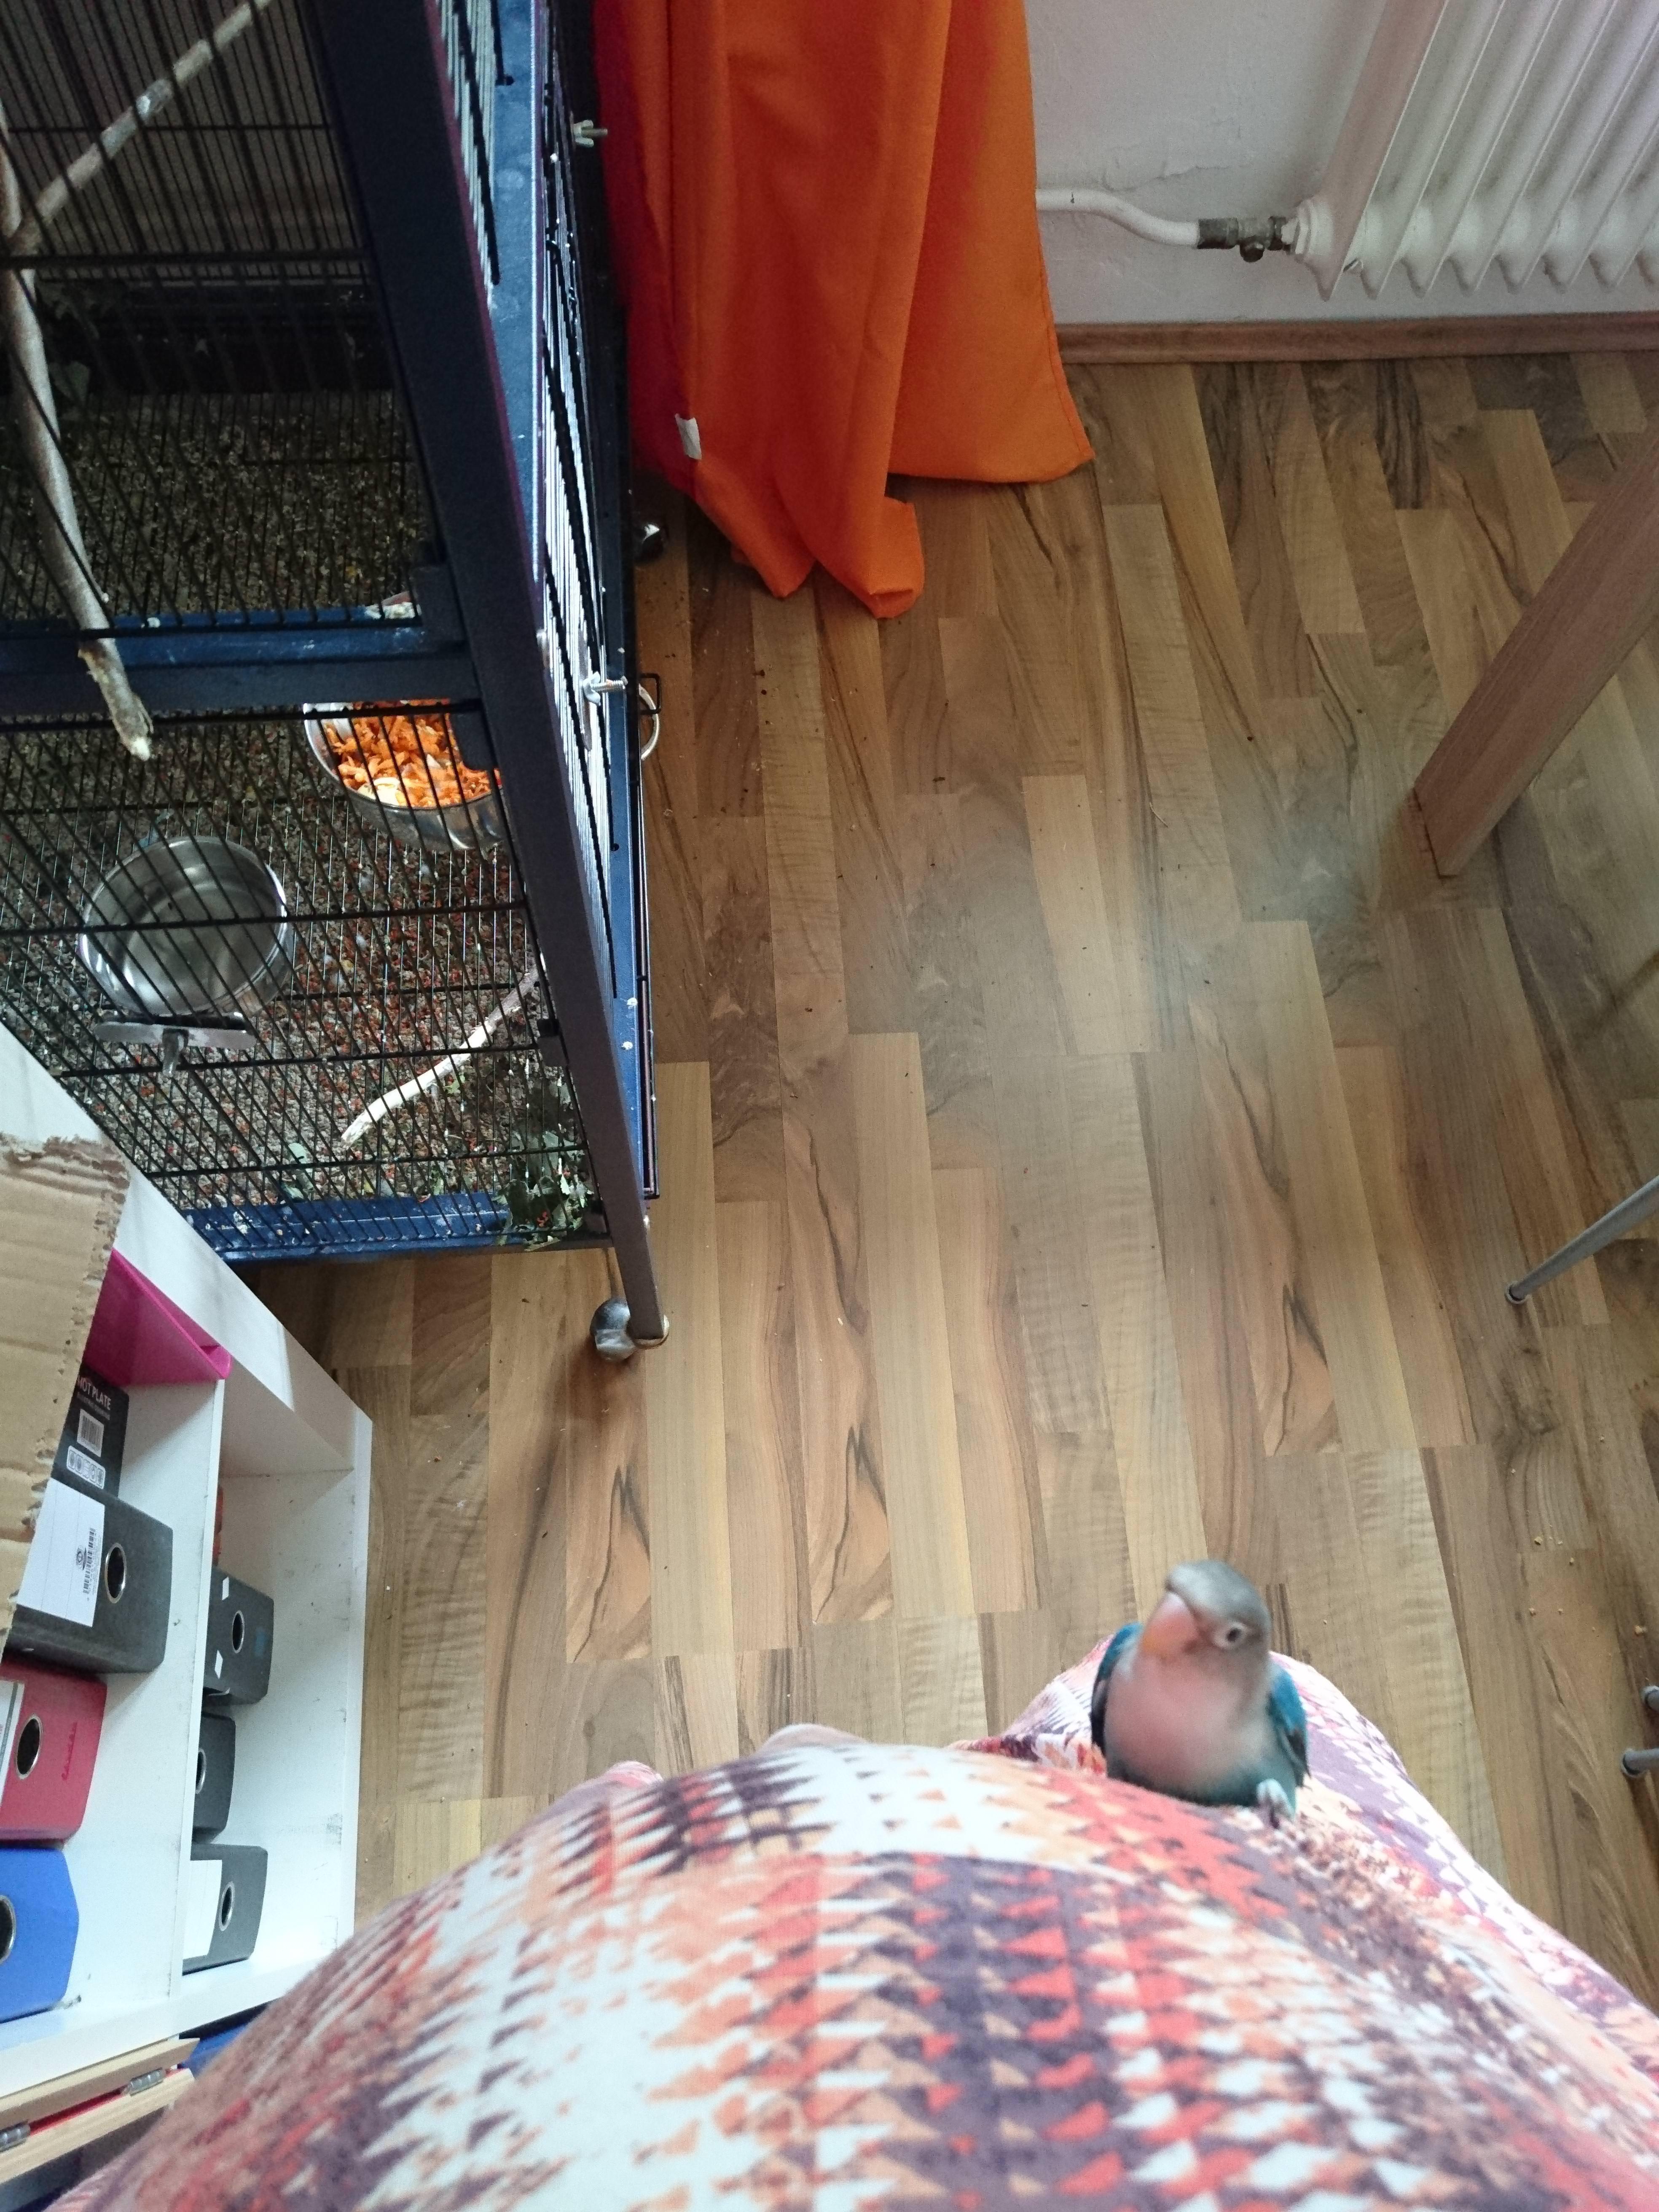 hardwood floor refinishing little rock ar of http imgur com gallery px1qz daily http imgur com 2al0zgq in g7rectp